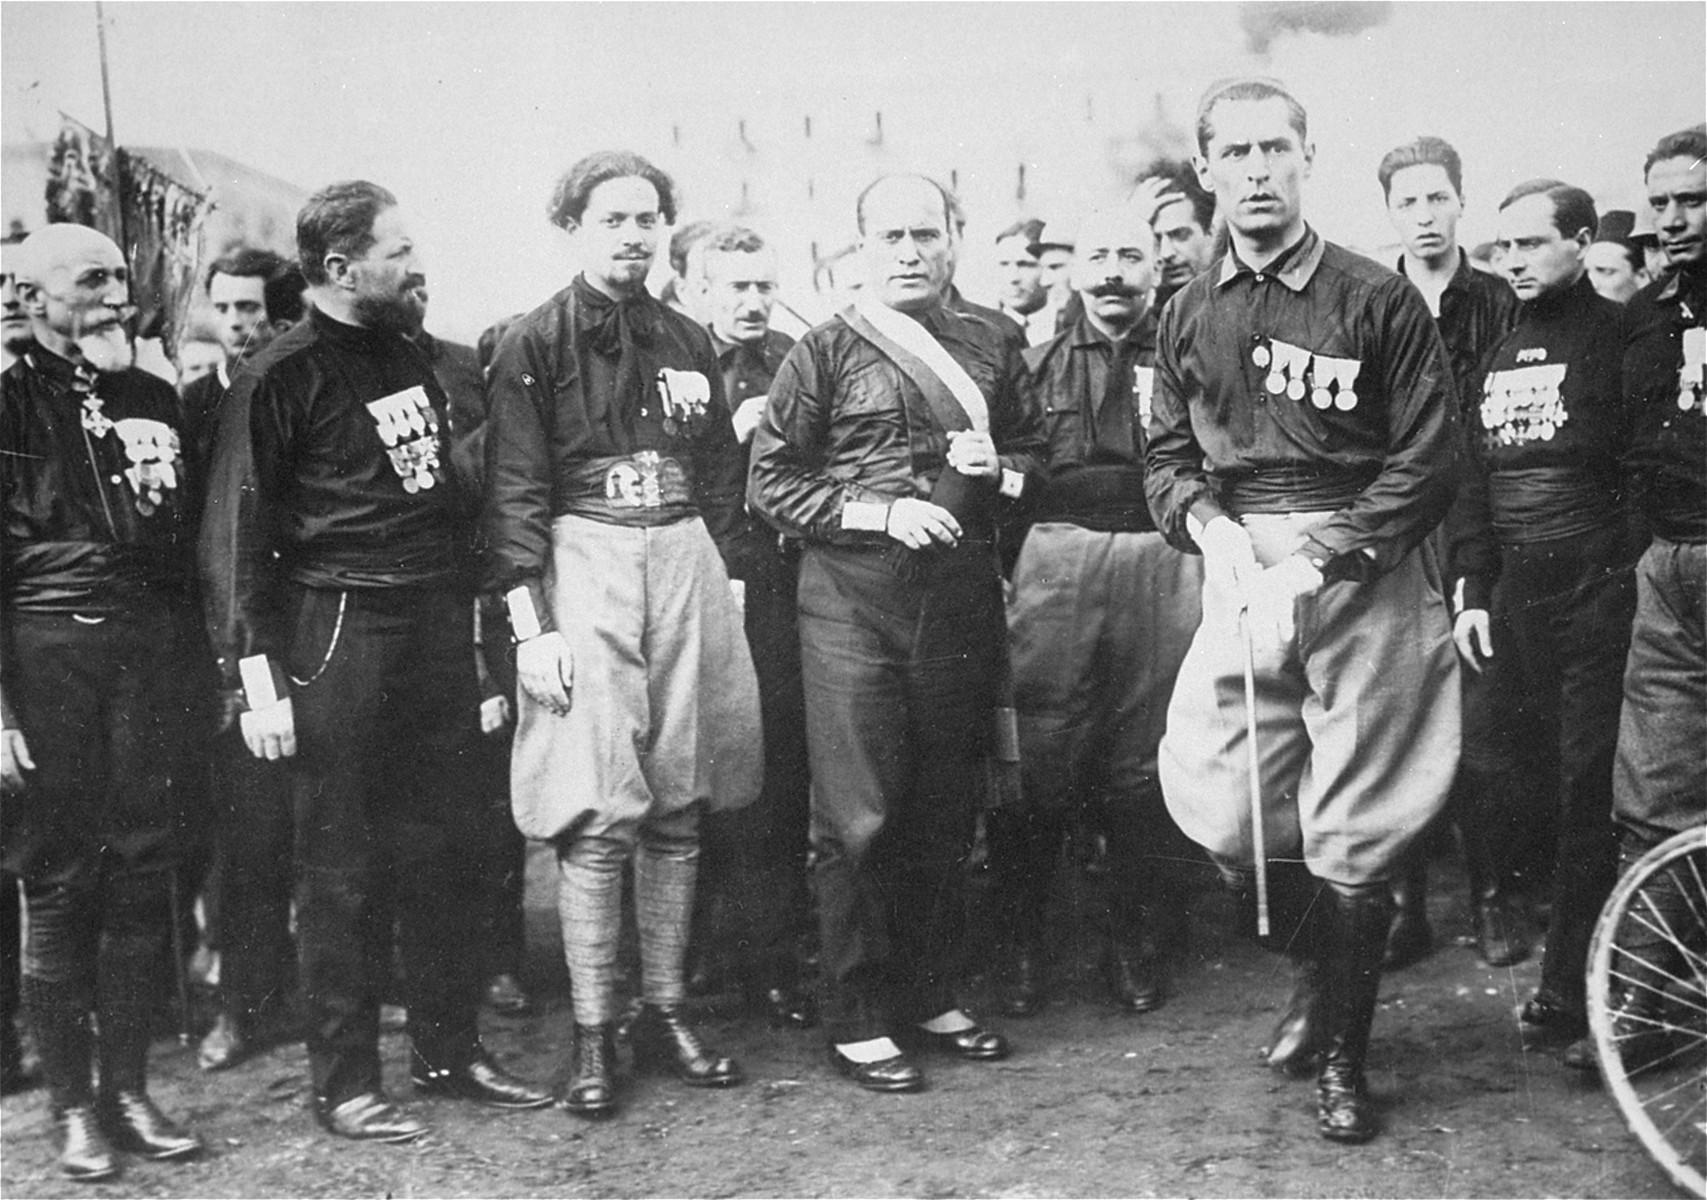 "Mussolini poses with comrades in the Black Shirts.  Pictured on the far left is Emilio De Bono. De Bono was nominated as Director General of the Police (Direttore Generale della P.S.) on 11 November 1922. His title was changed to ""Intendente Generale di polizia"" on 11 November 1923 and then on 20 December 1923, his title became ""Capo della Poliza"" or Head of Police."